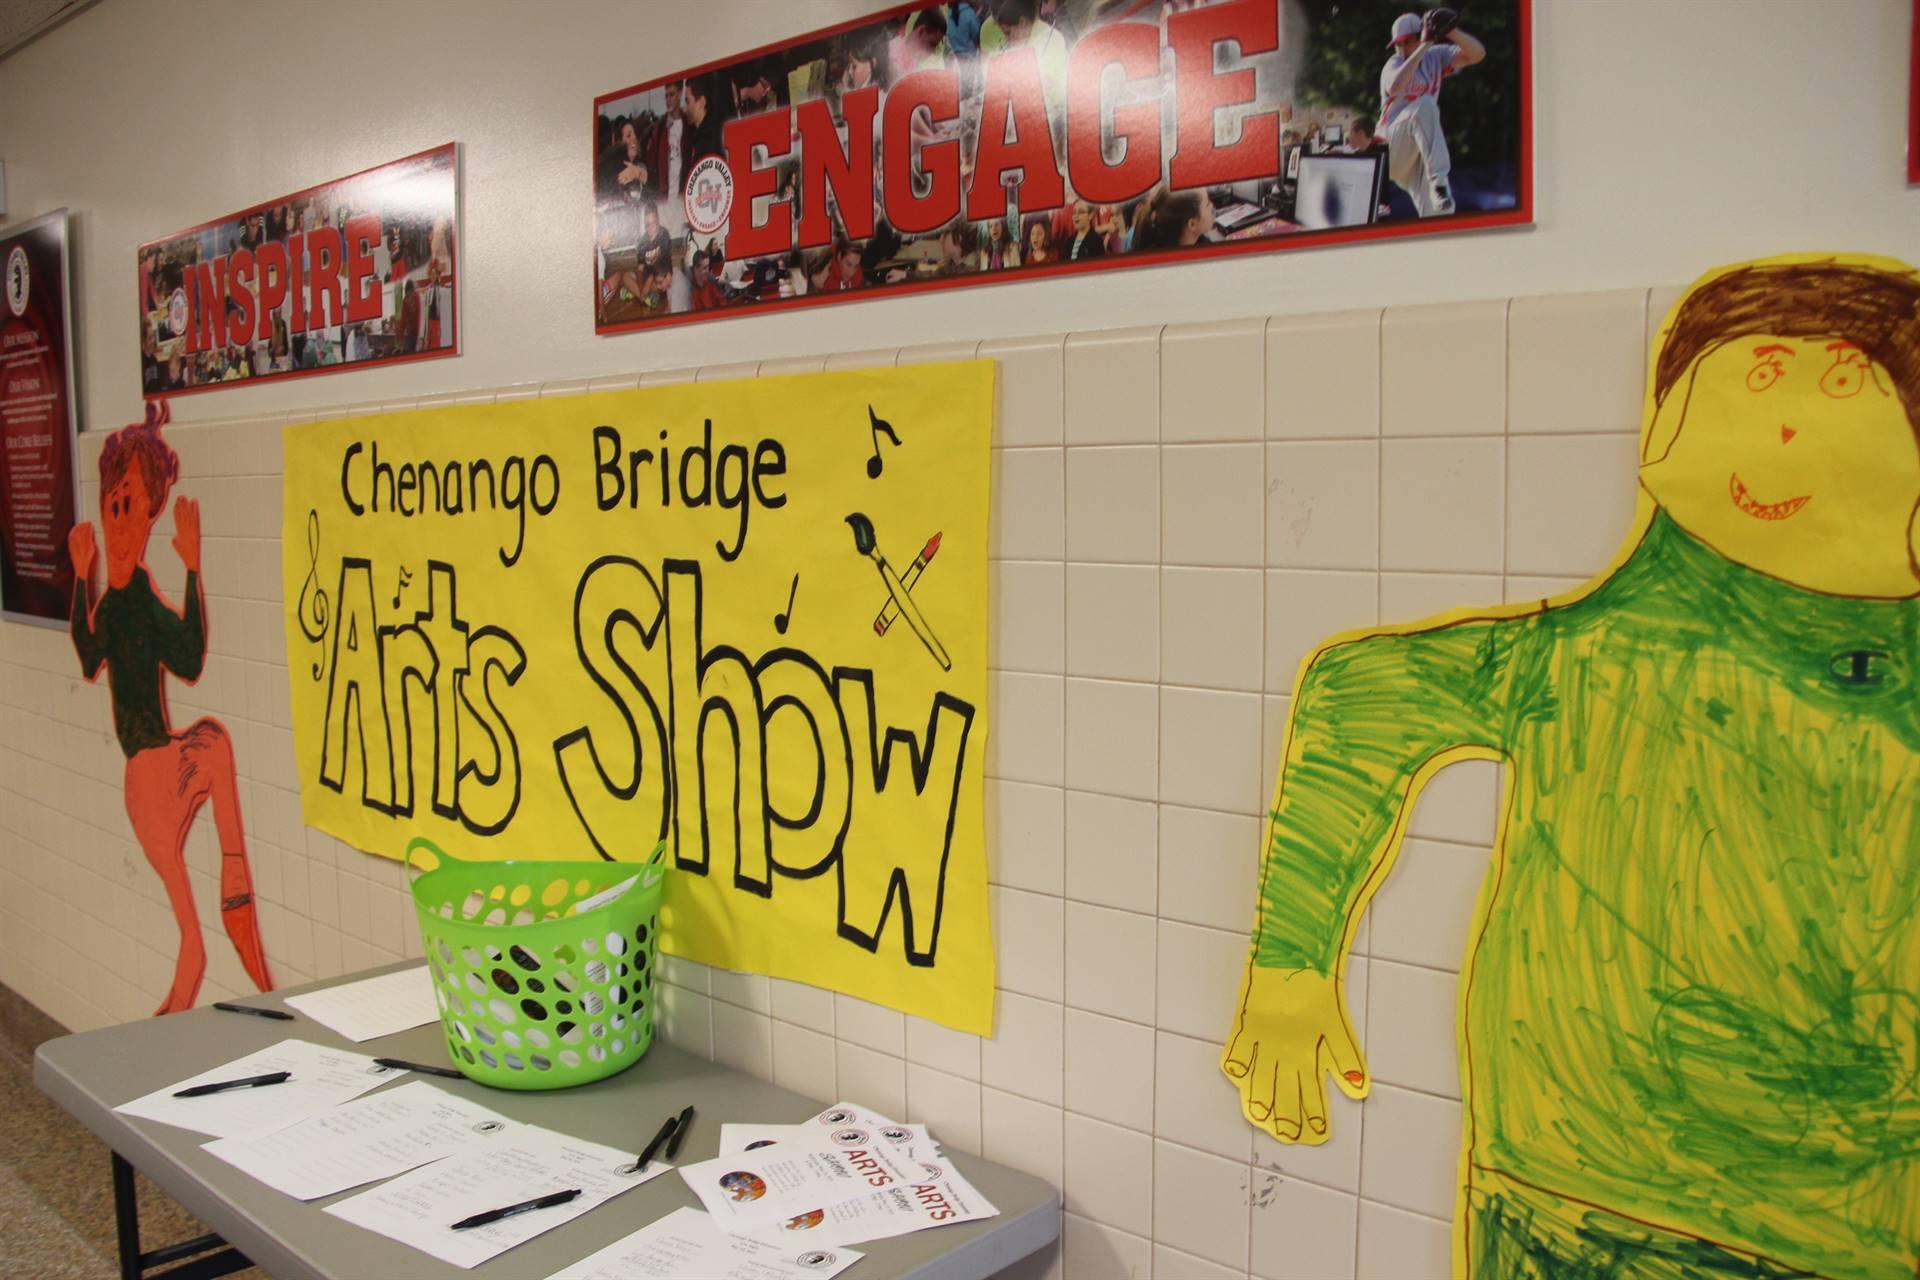 Chenango Bridge Arts Show 14